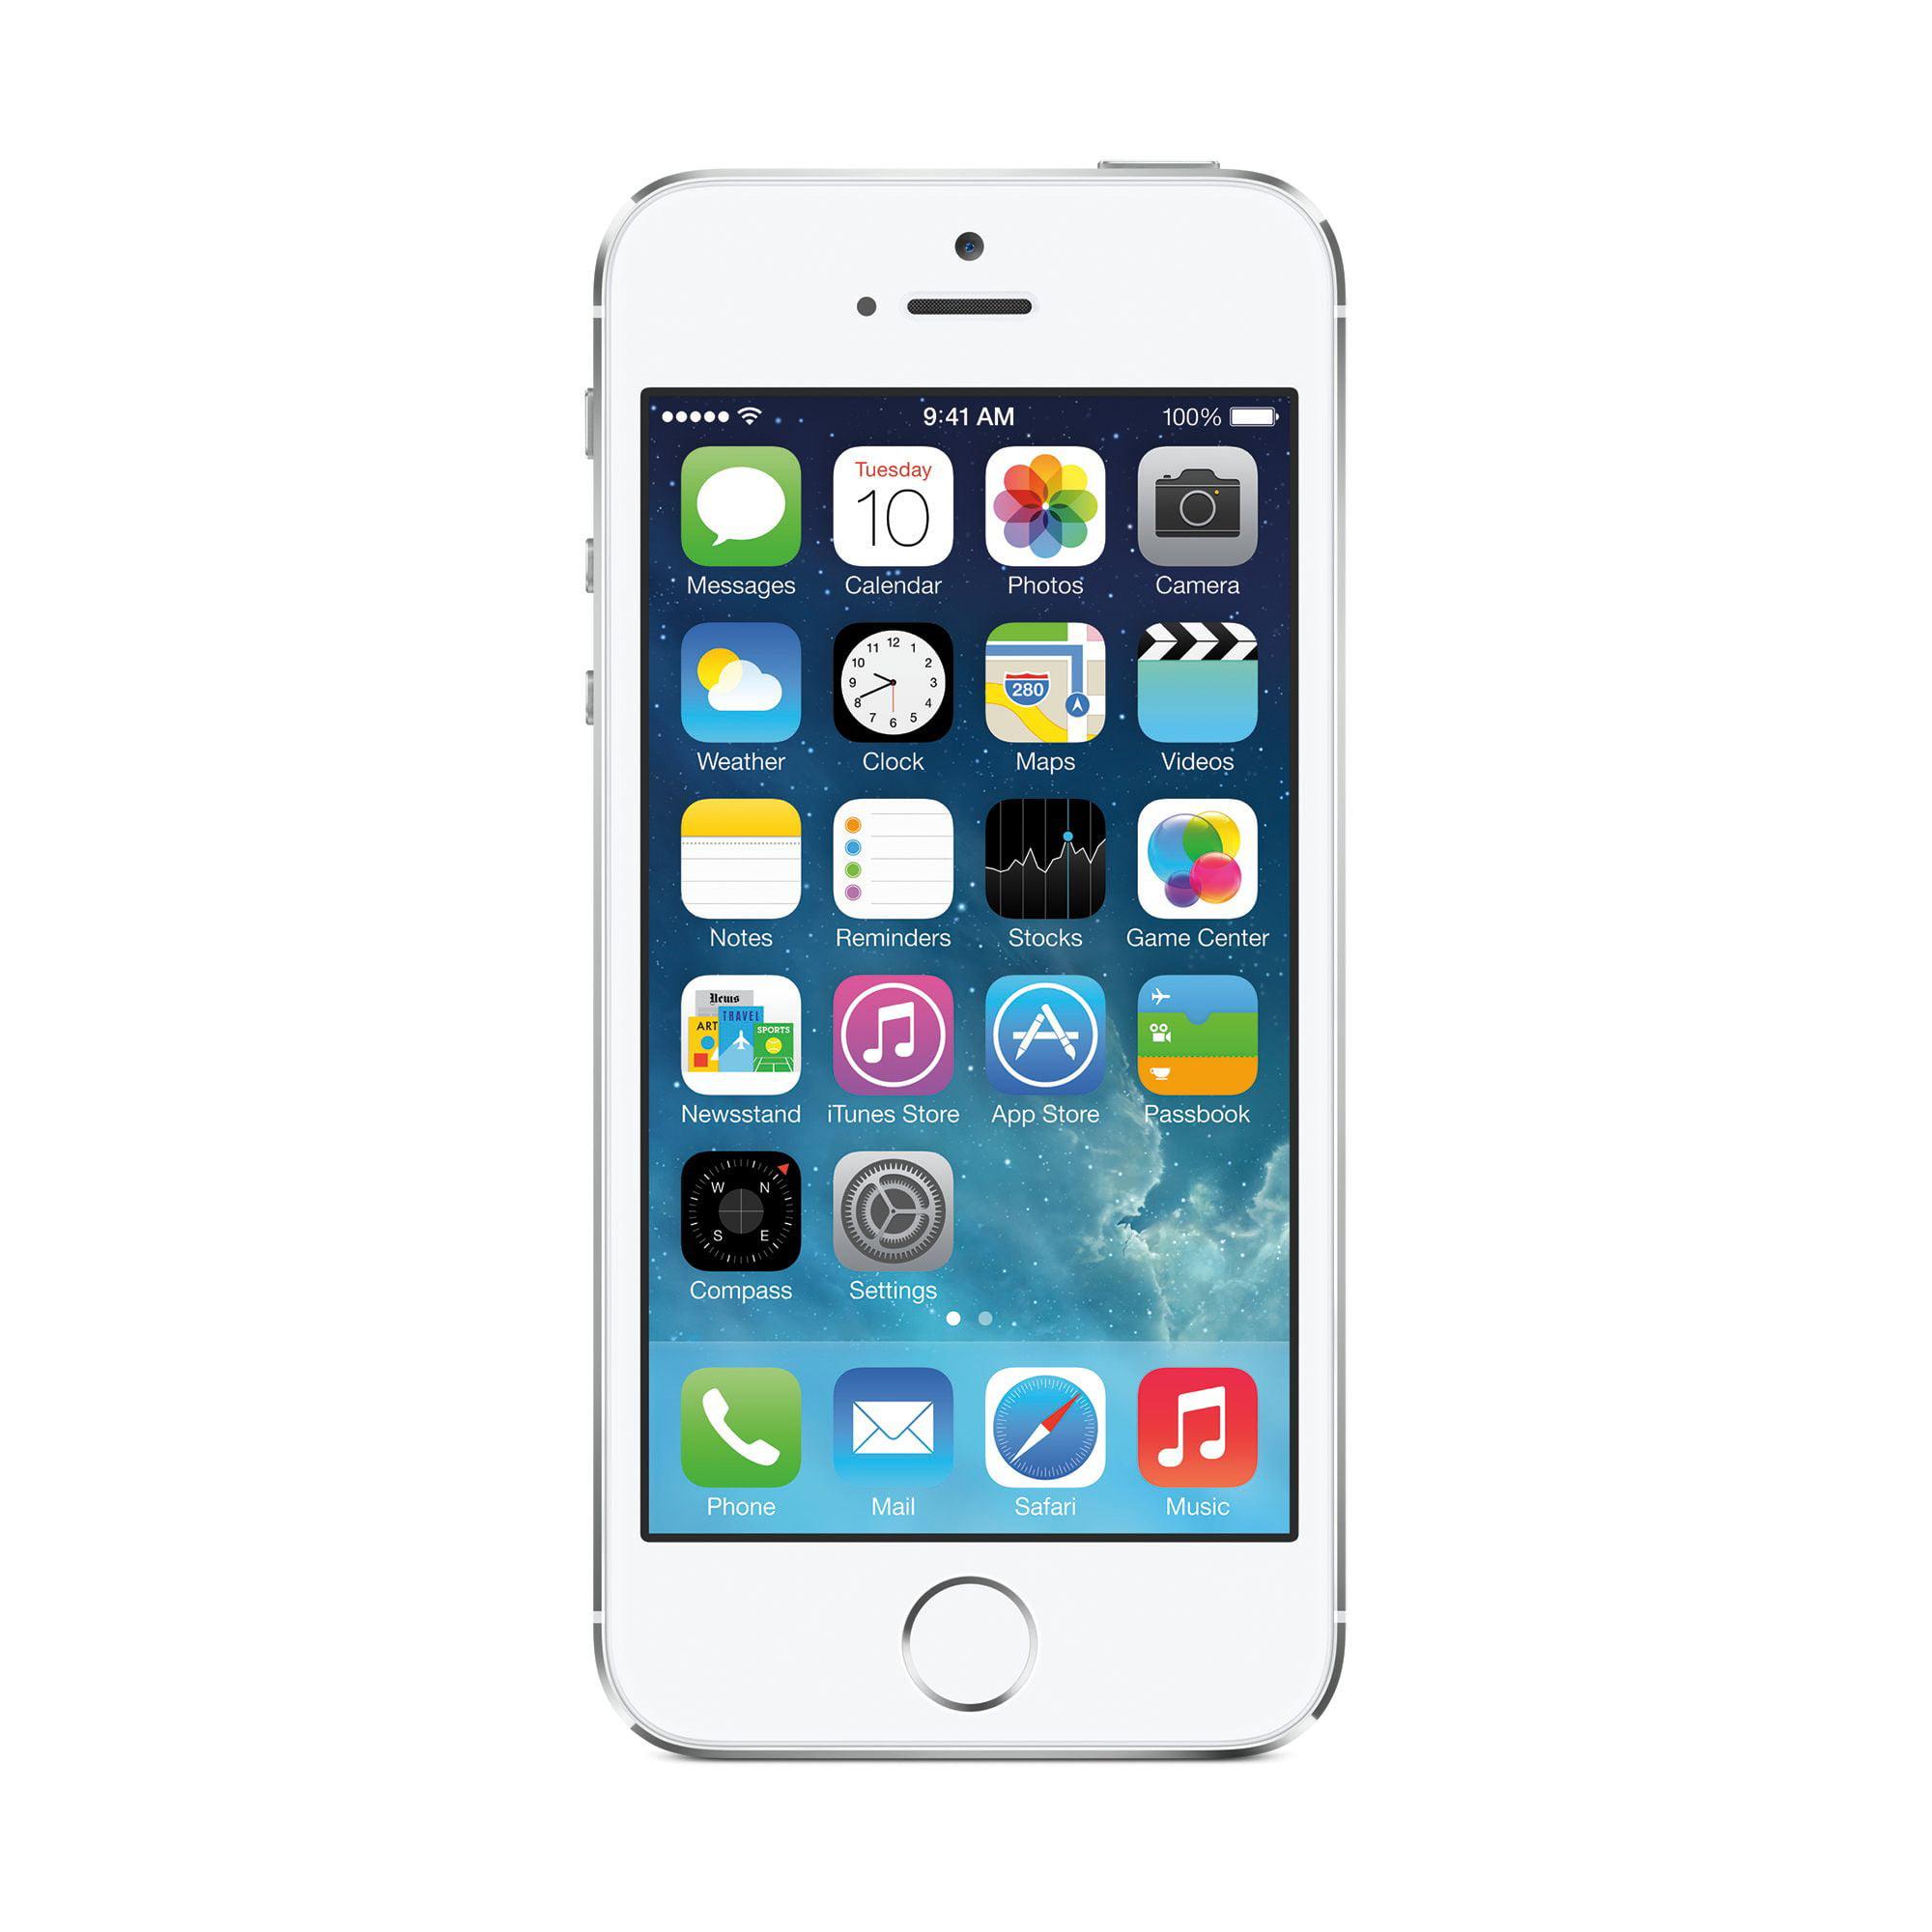 Straight Talk Prepaid Apple iPhone 5S 16GB CDMA Smartphone, Refurbished by Apple